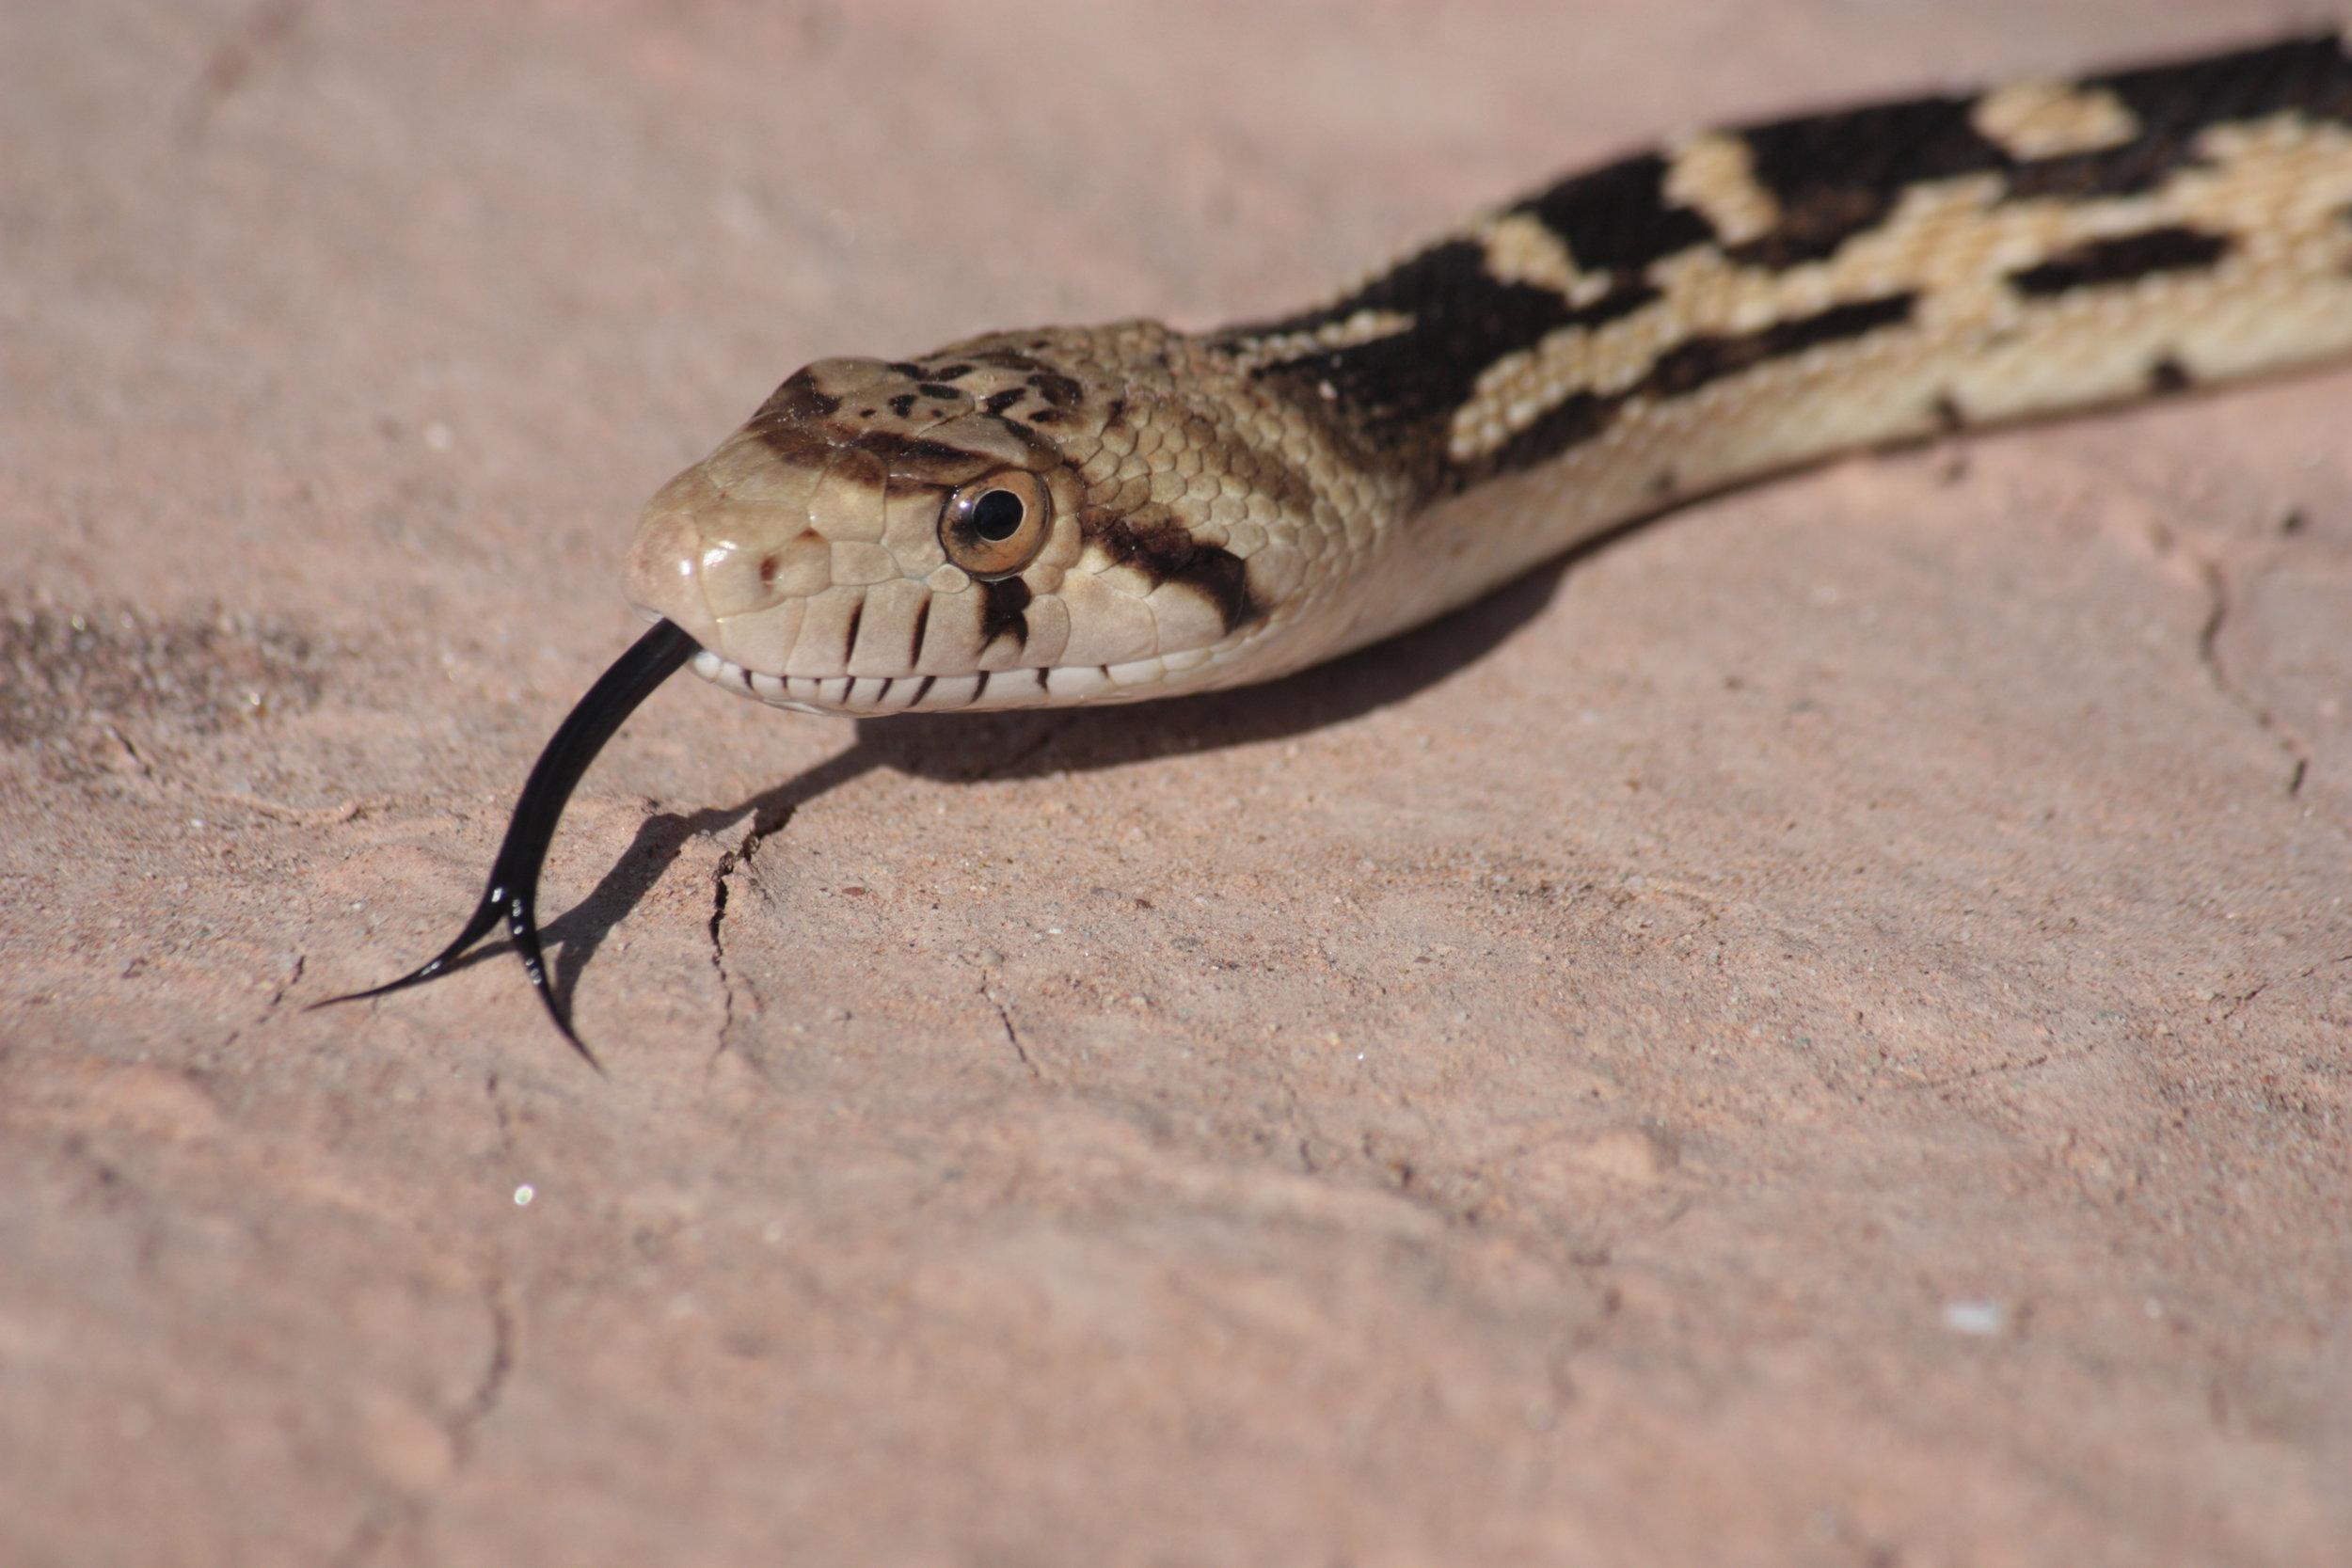 great-basin-gopher-snake-pituophis-catenifer_26058848685_o.jpg